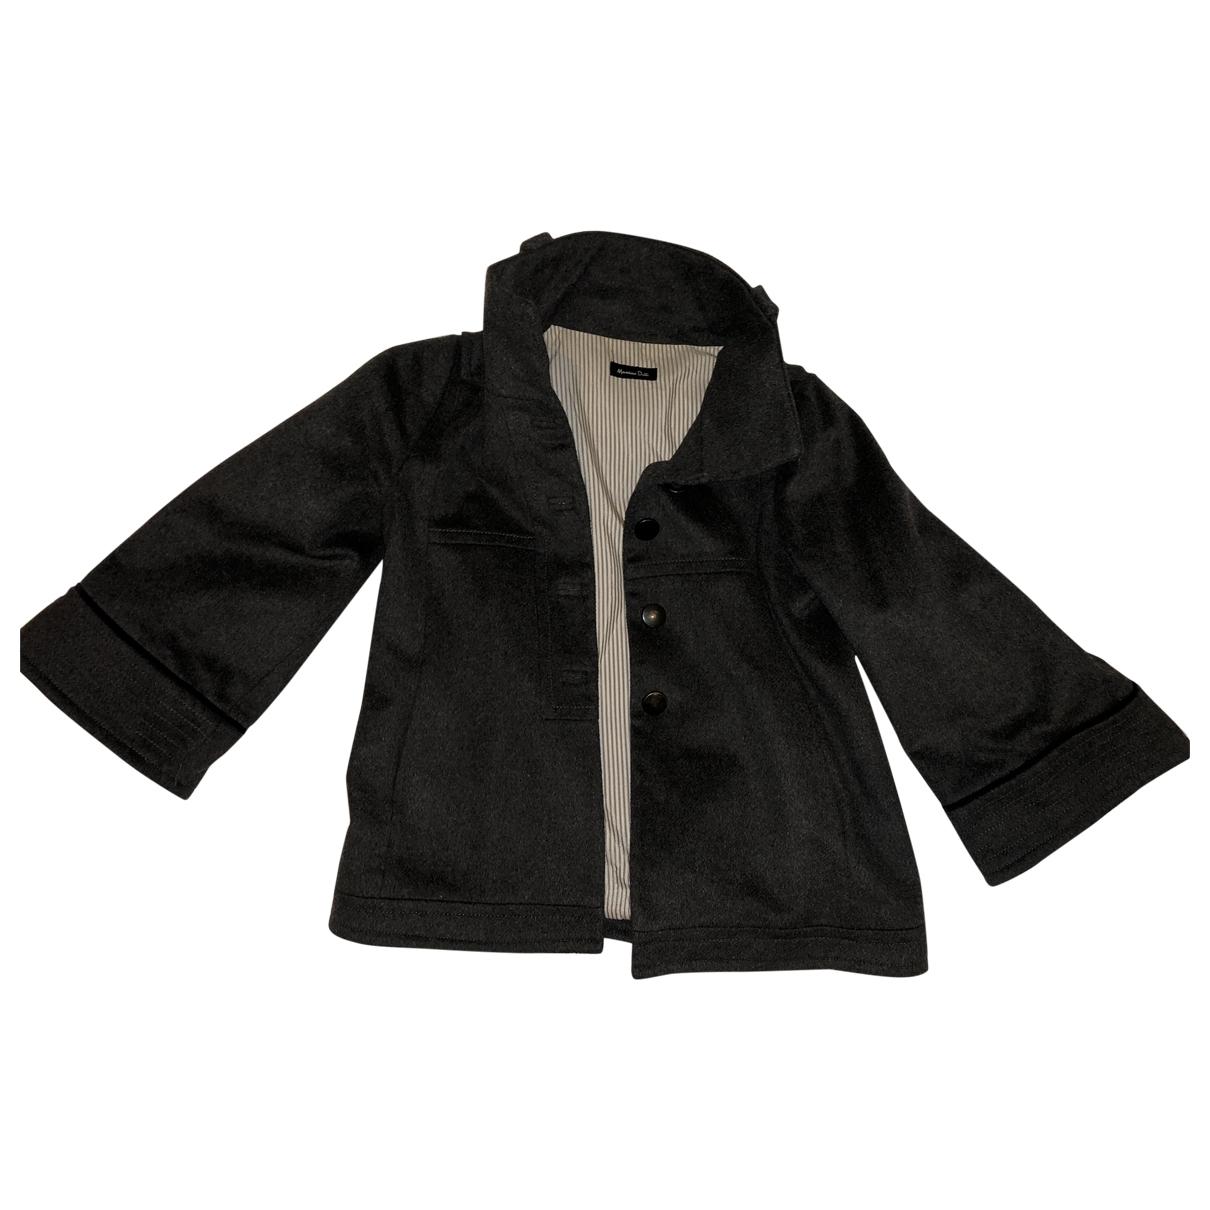 Massimo Dutti \N Grey Wool jacket for Women S International